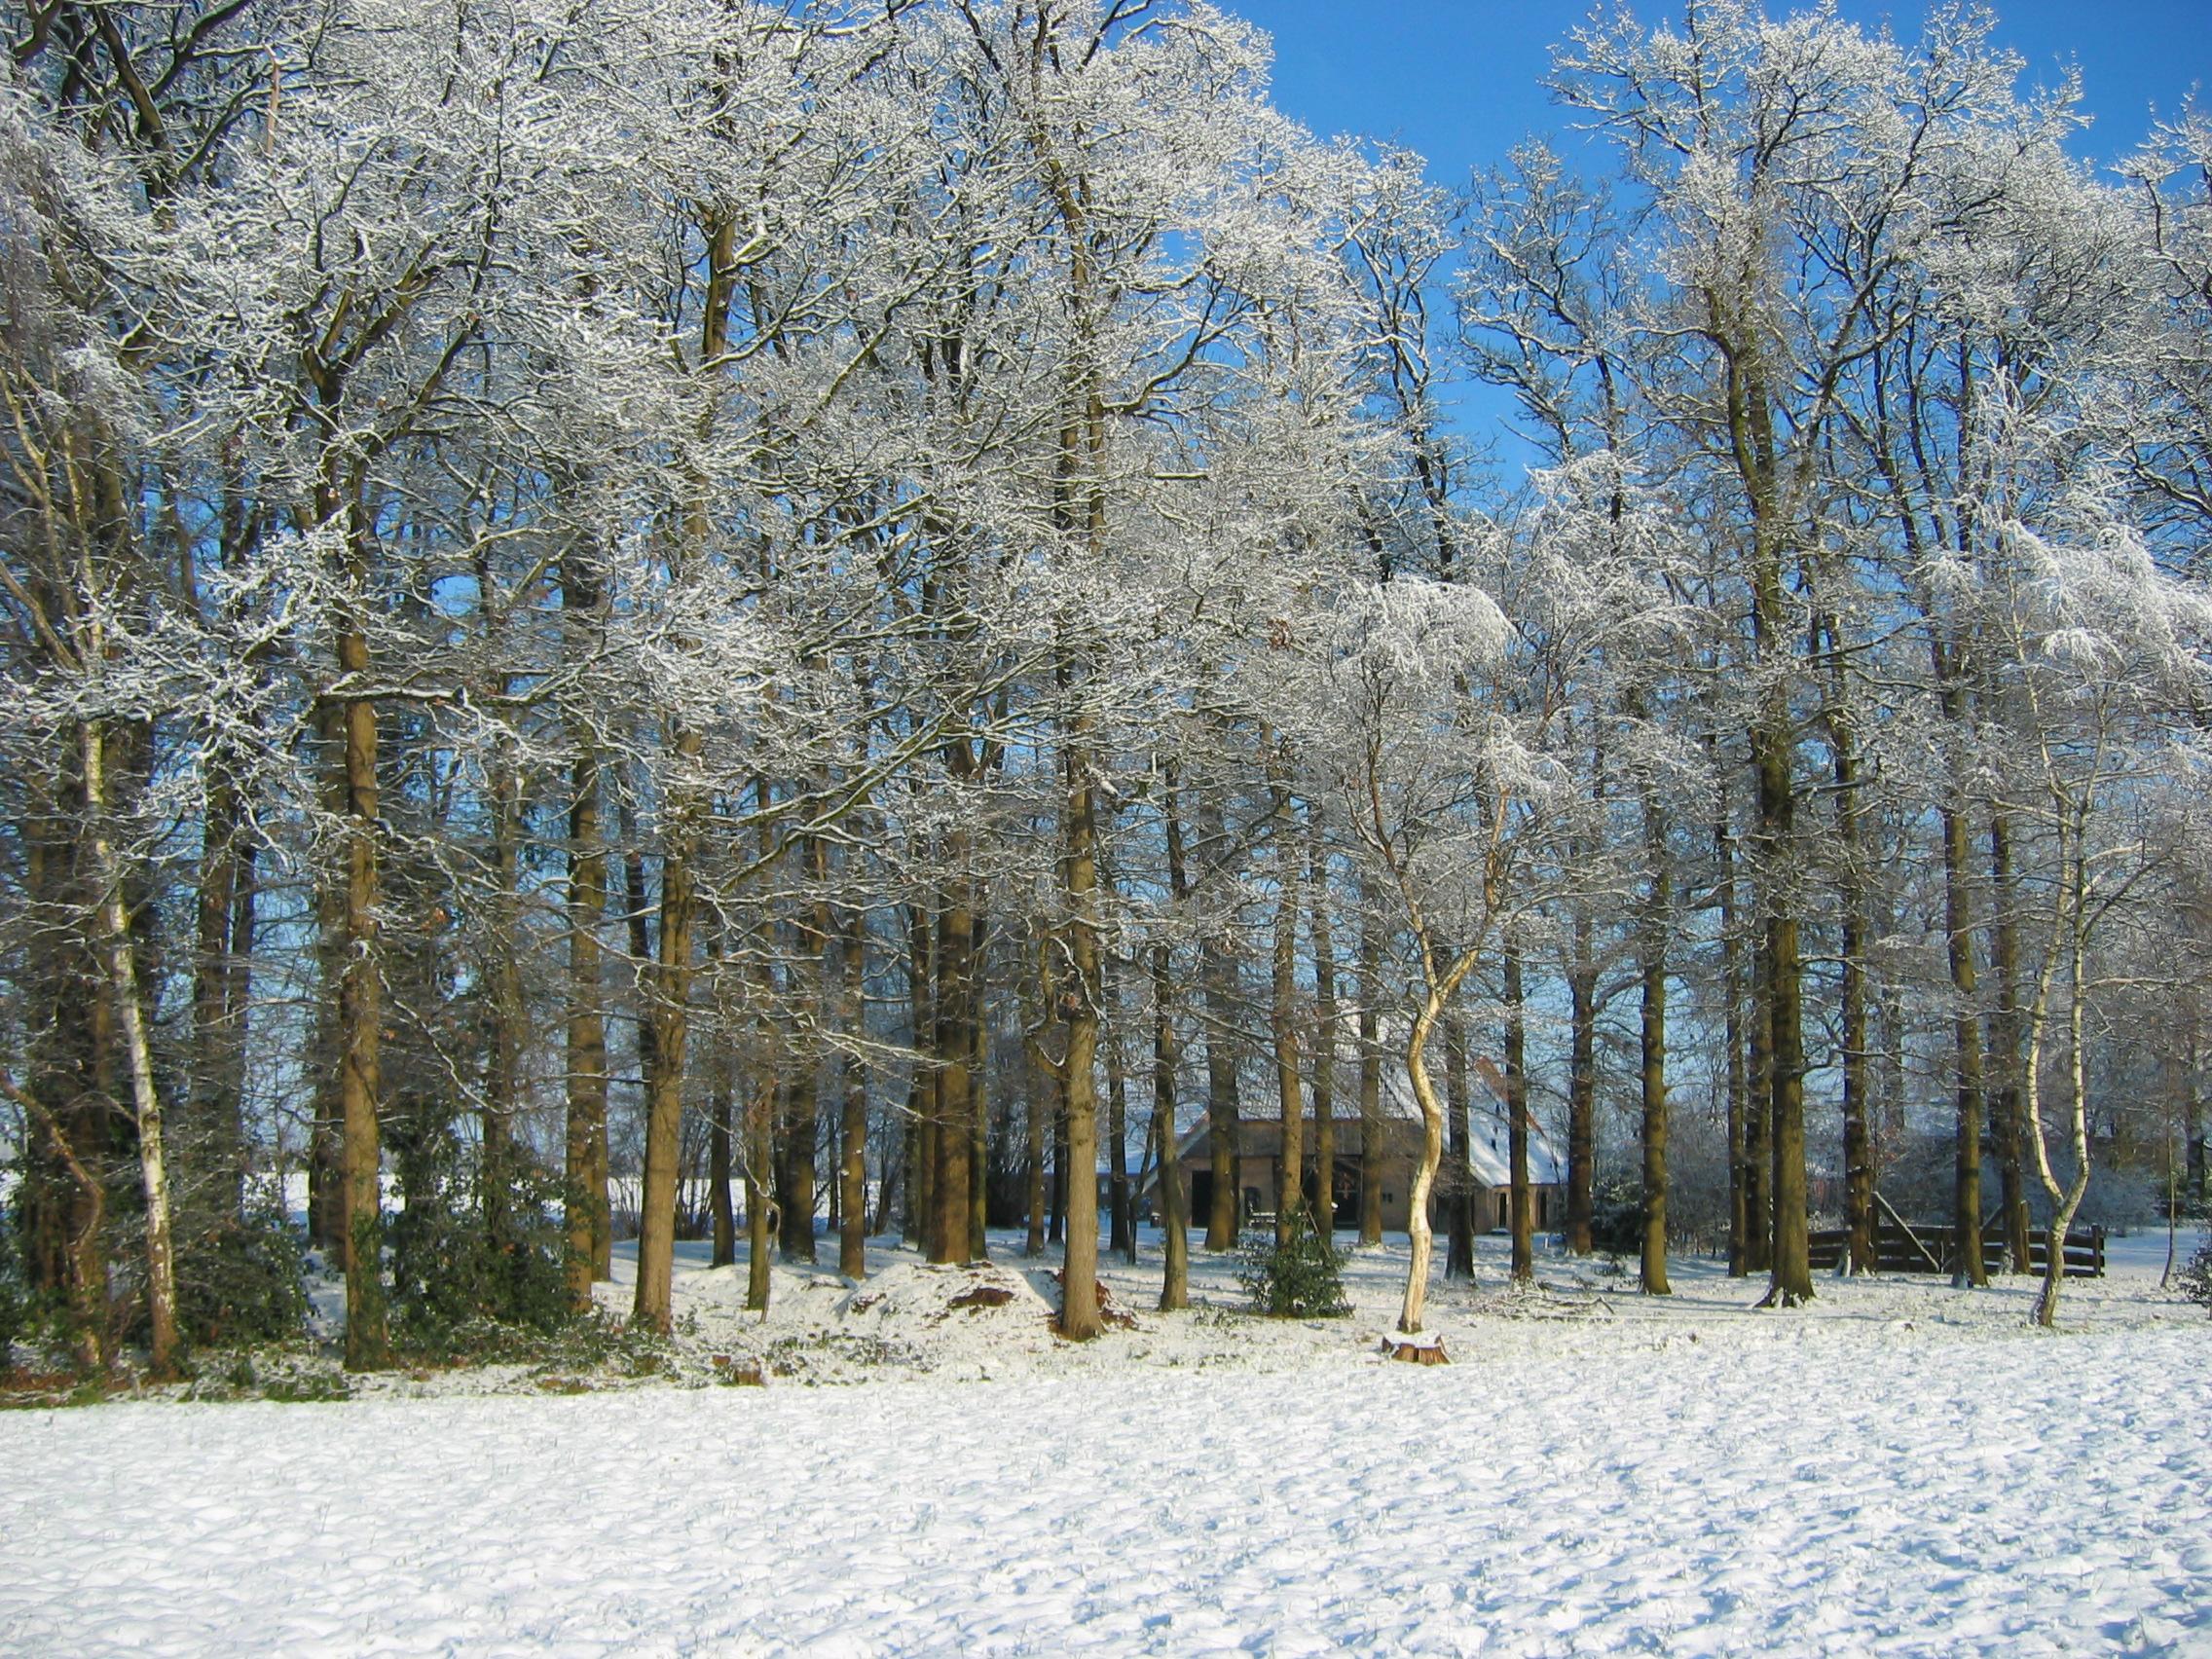 sneeuw2009-004